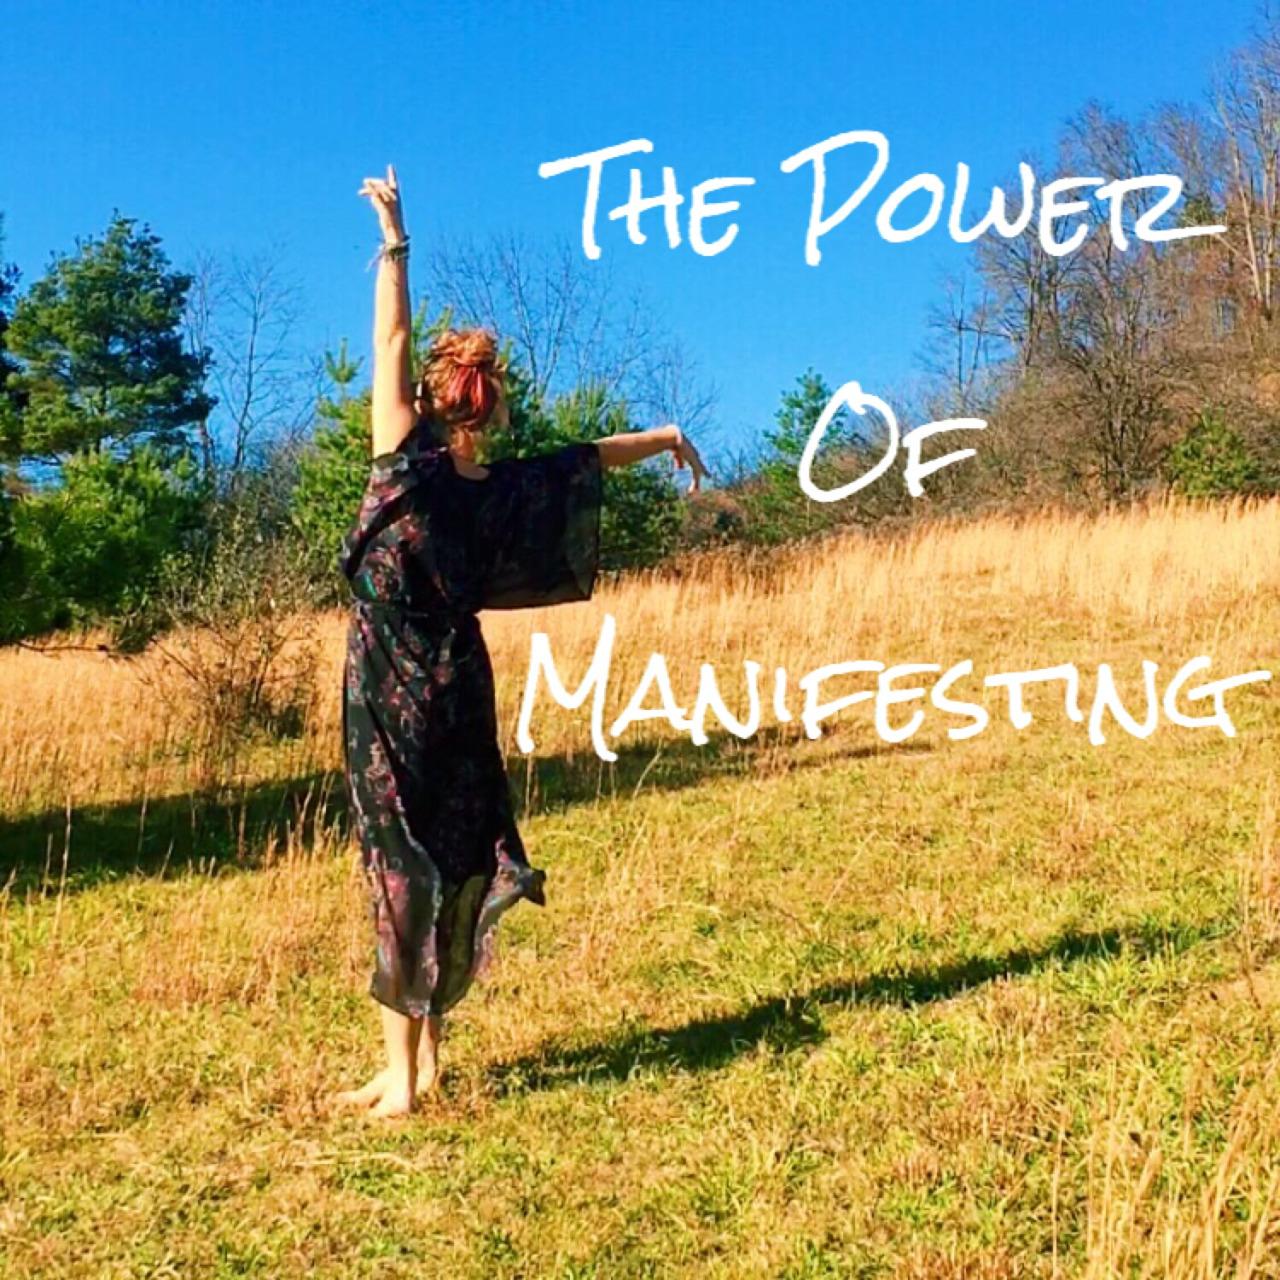 Manifesting Does Work